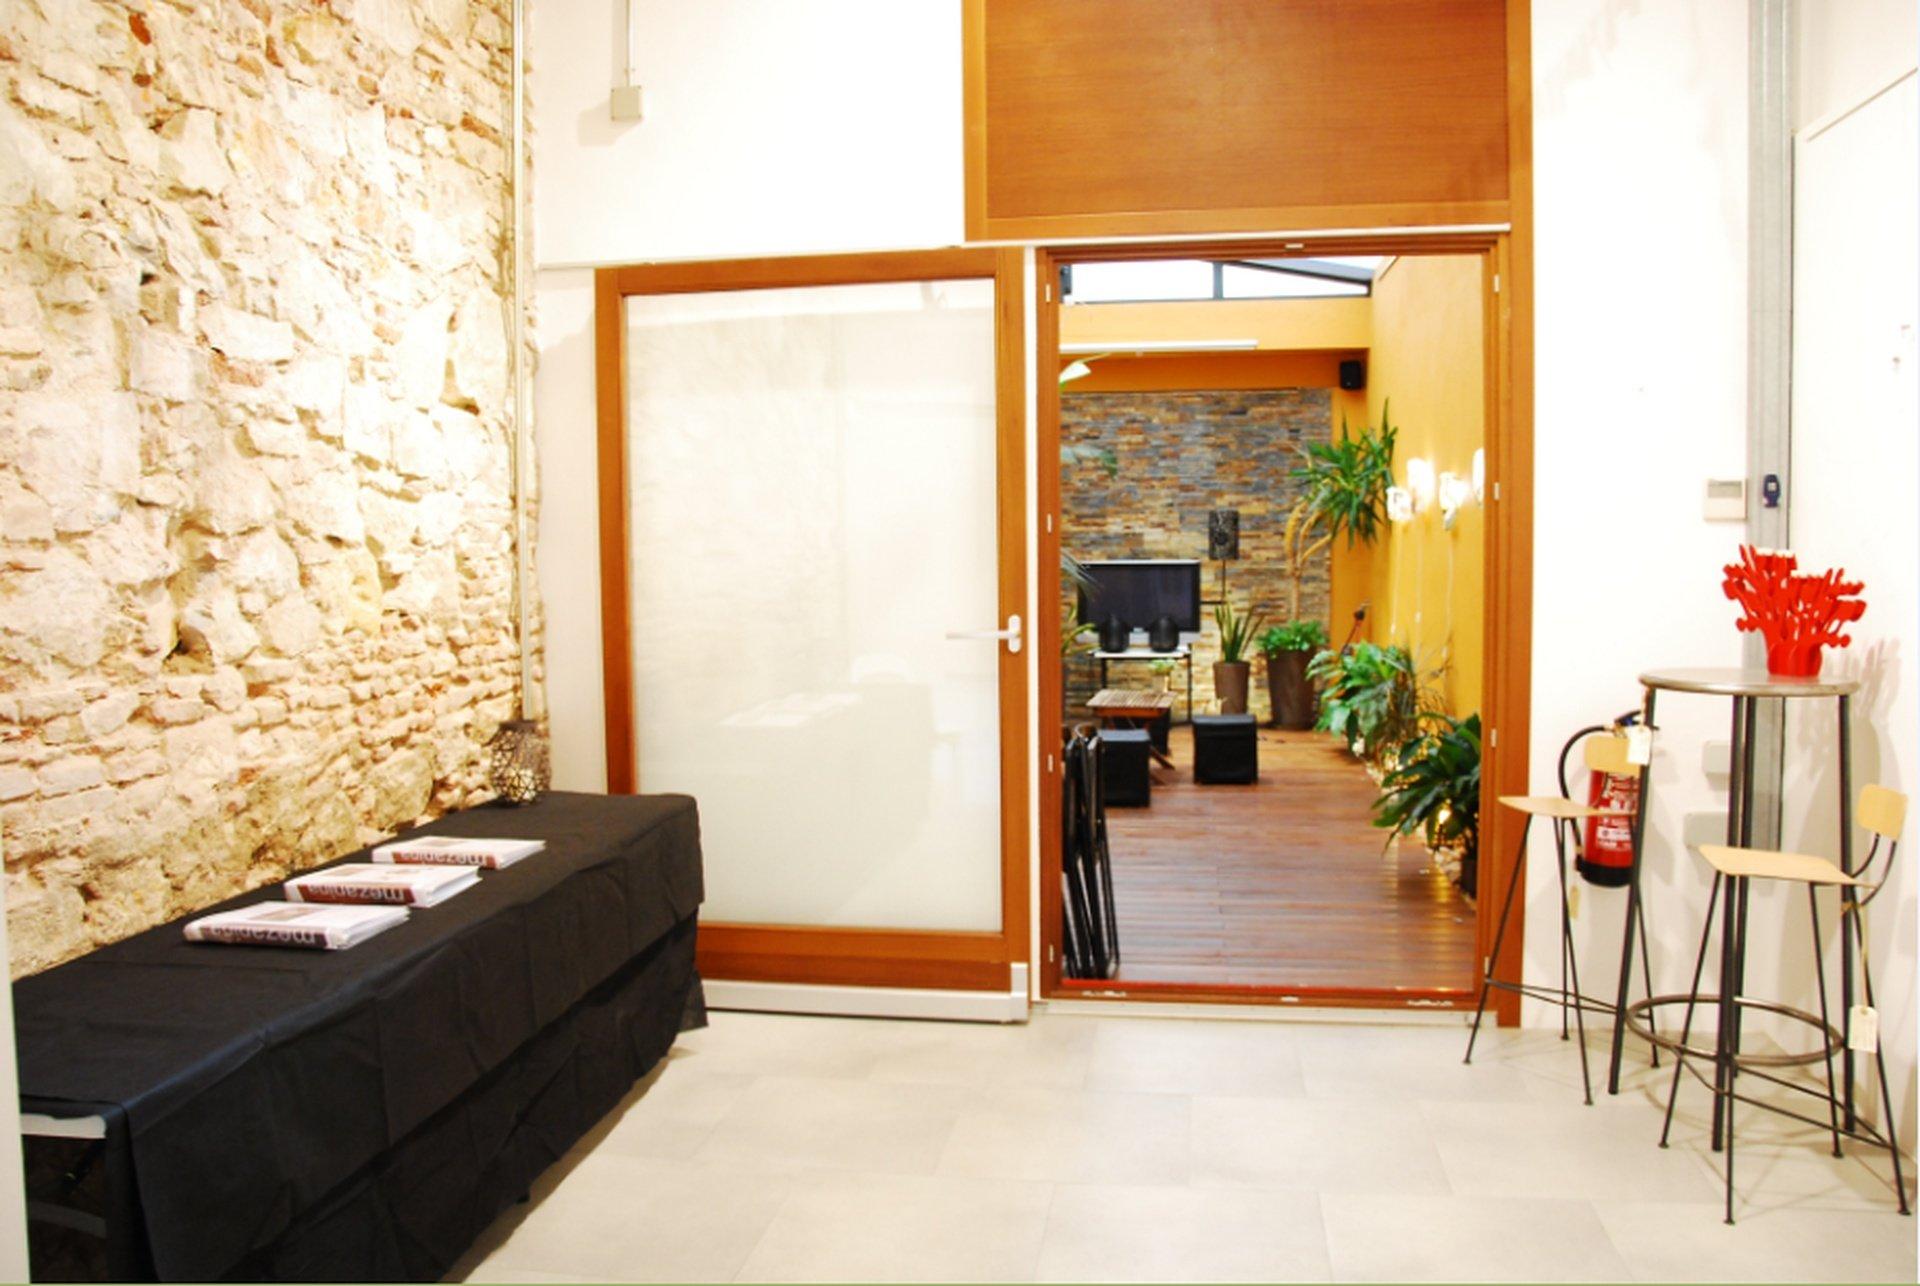 Barcelona workshop spaces Besonders Mezanina - Patio image 0